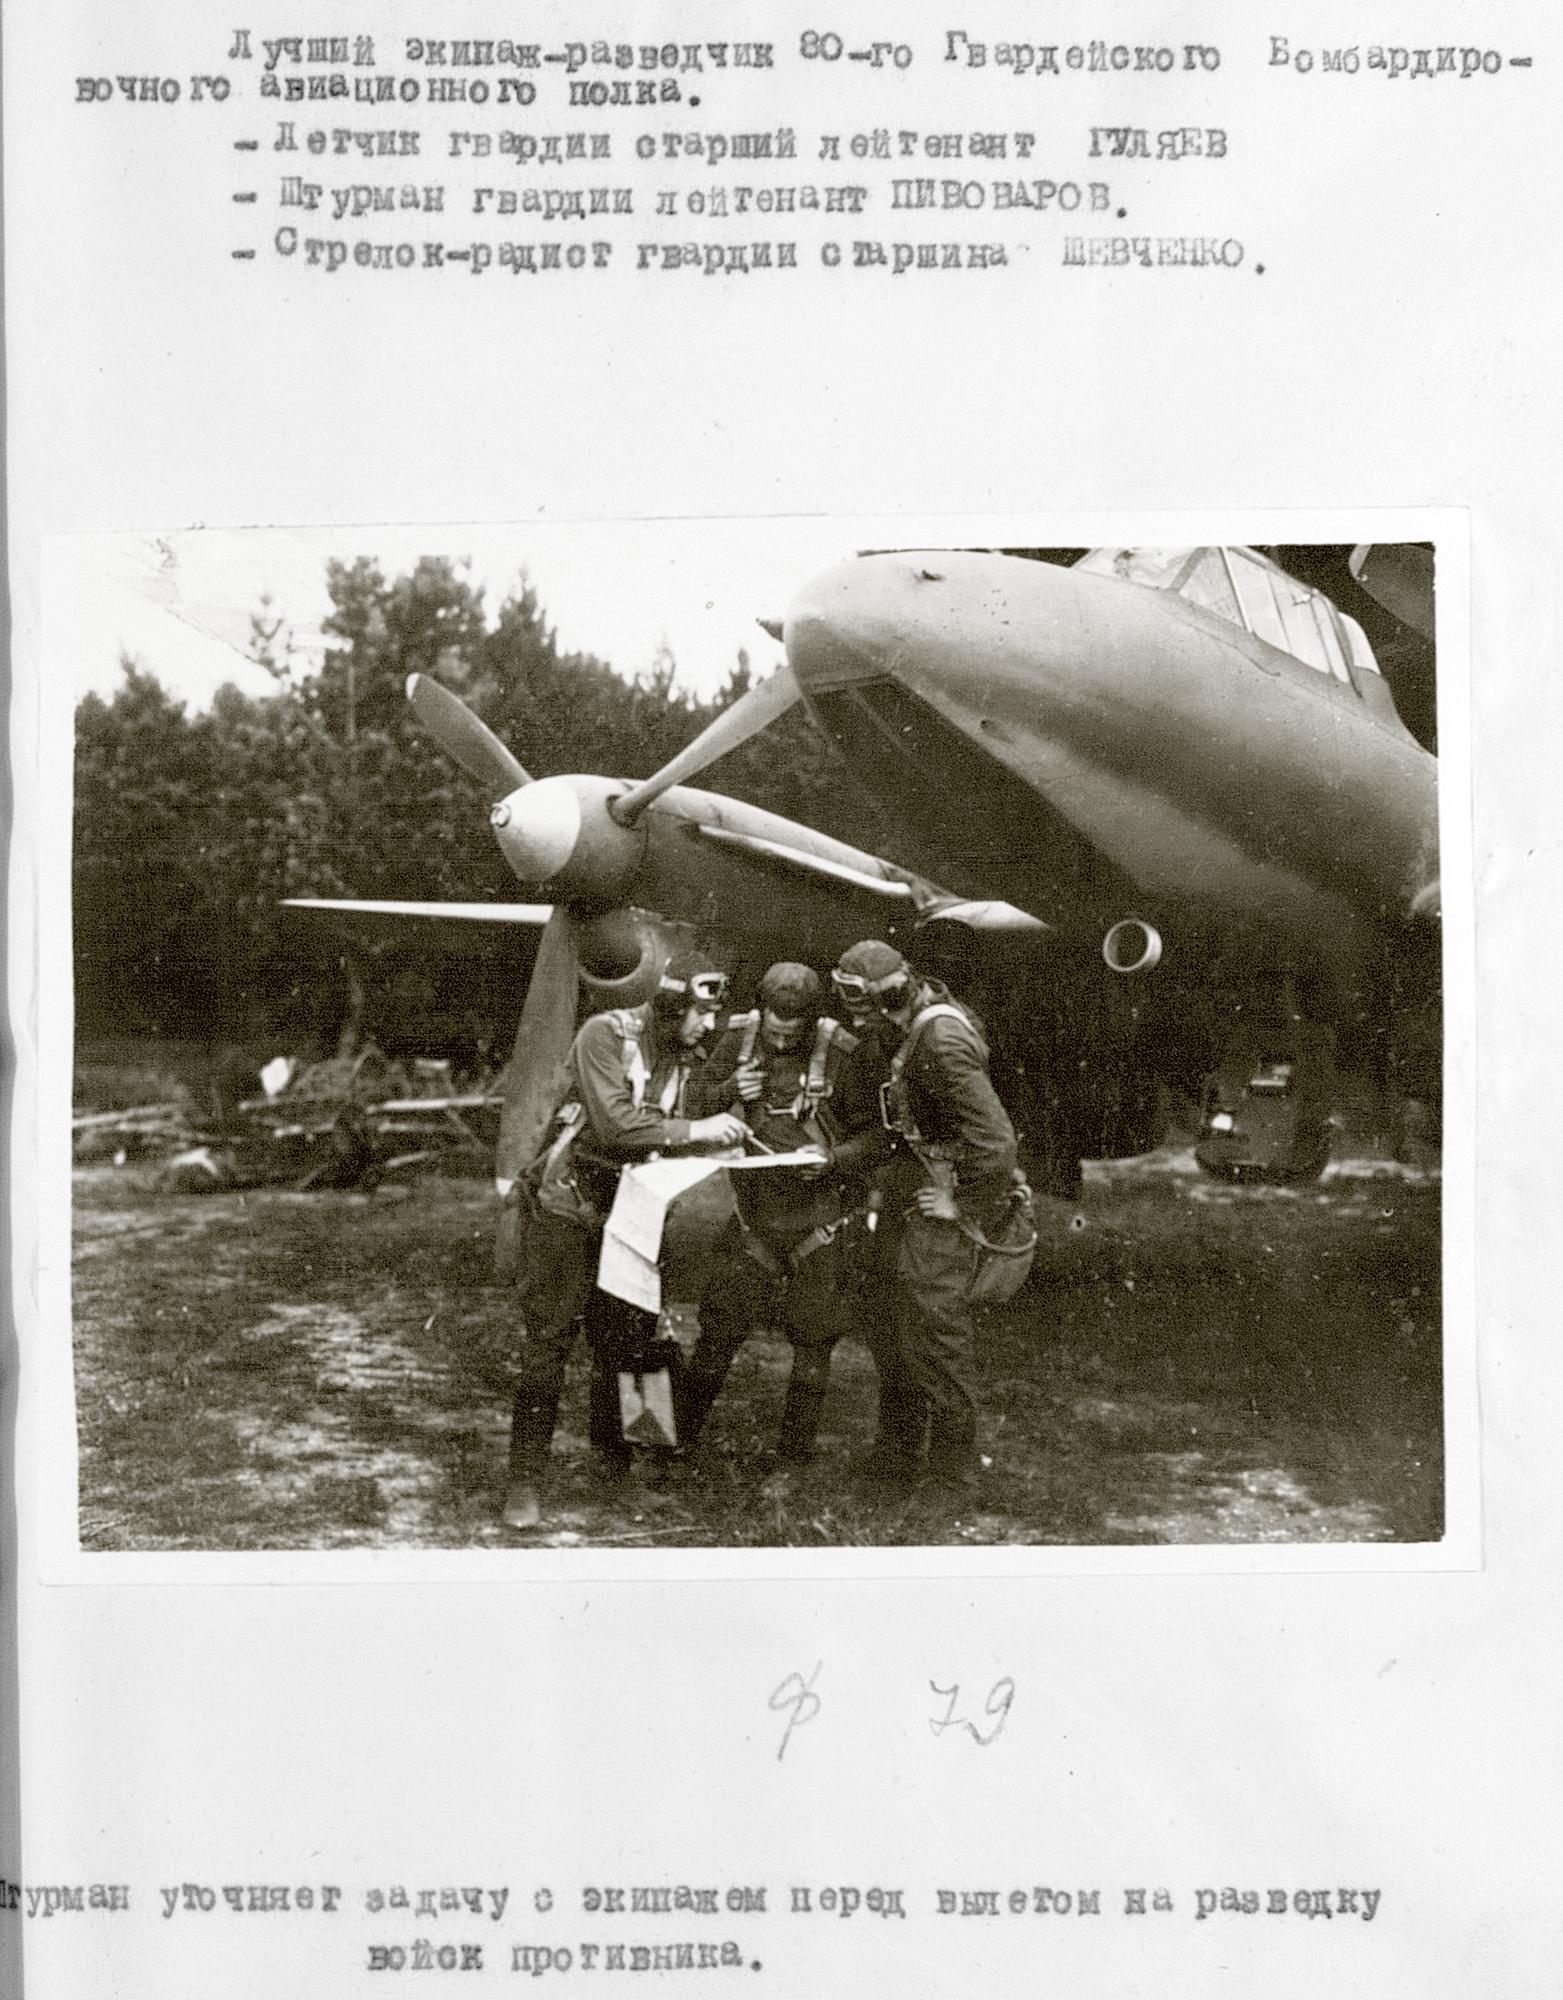 Petlyakov Pe 2 80GvBAP with crew Gulyaev,Pivovarov and Shevchenko 0A